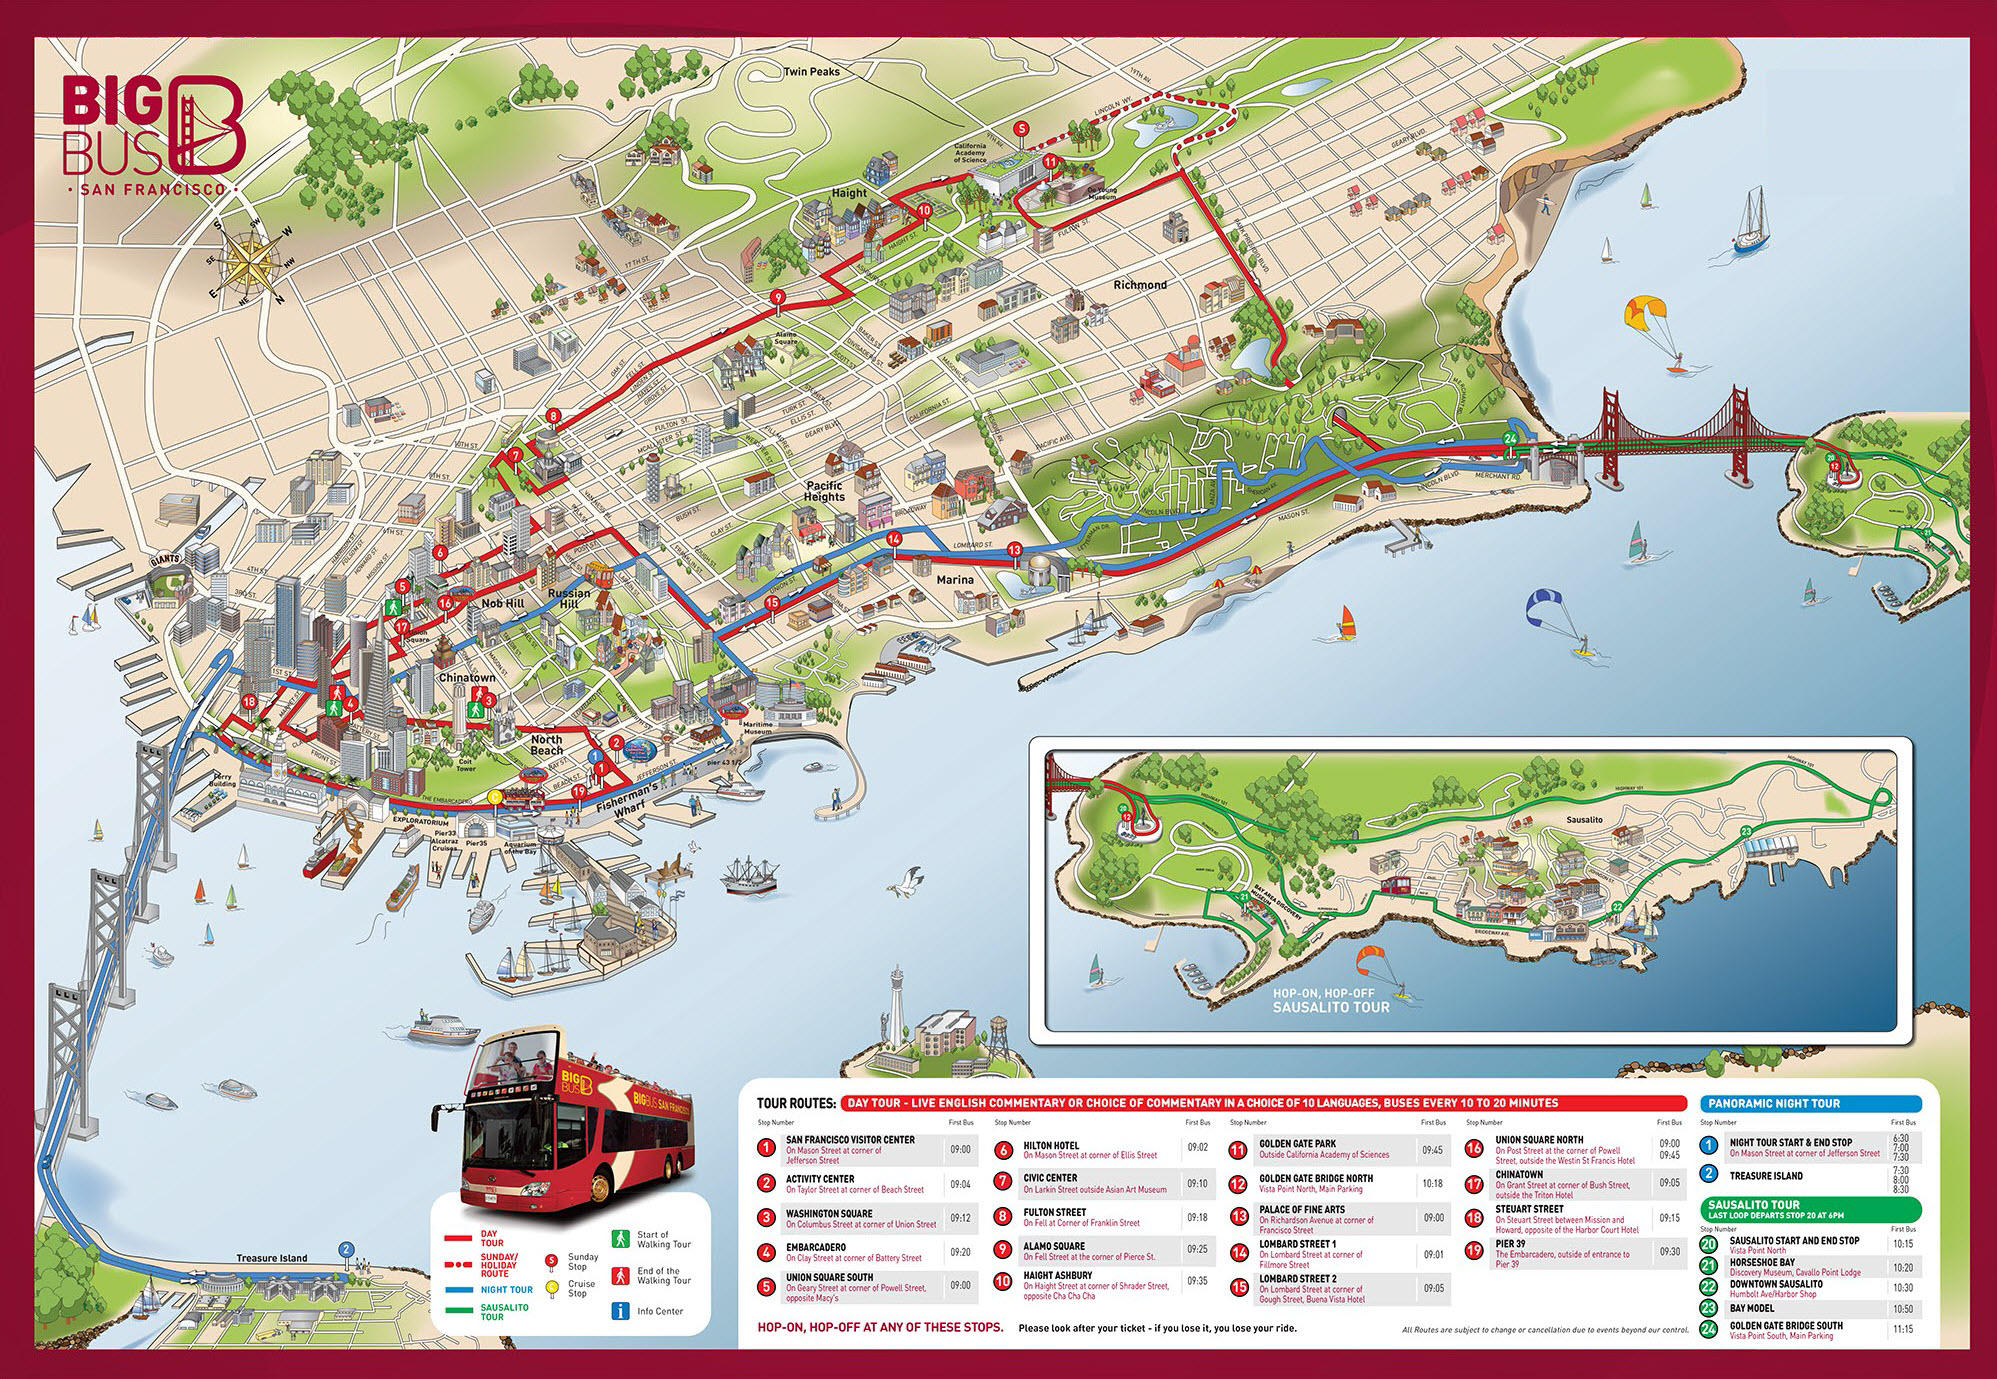 Big Bus San Francisco Map | Park Map